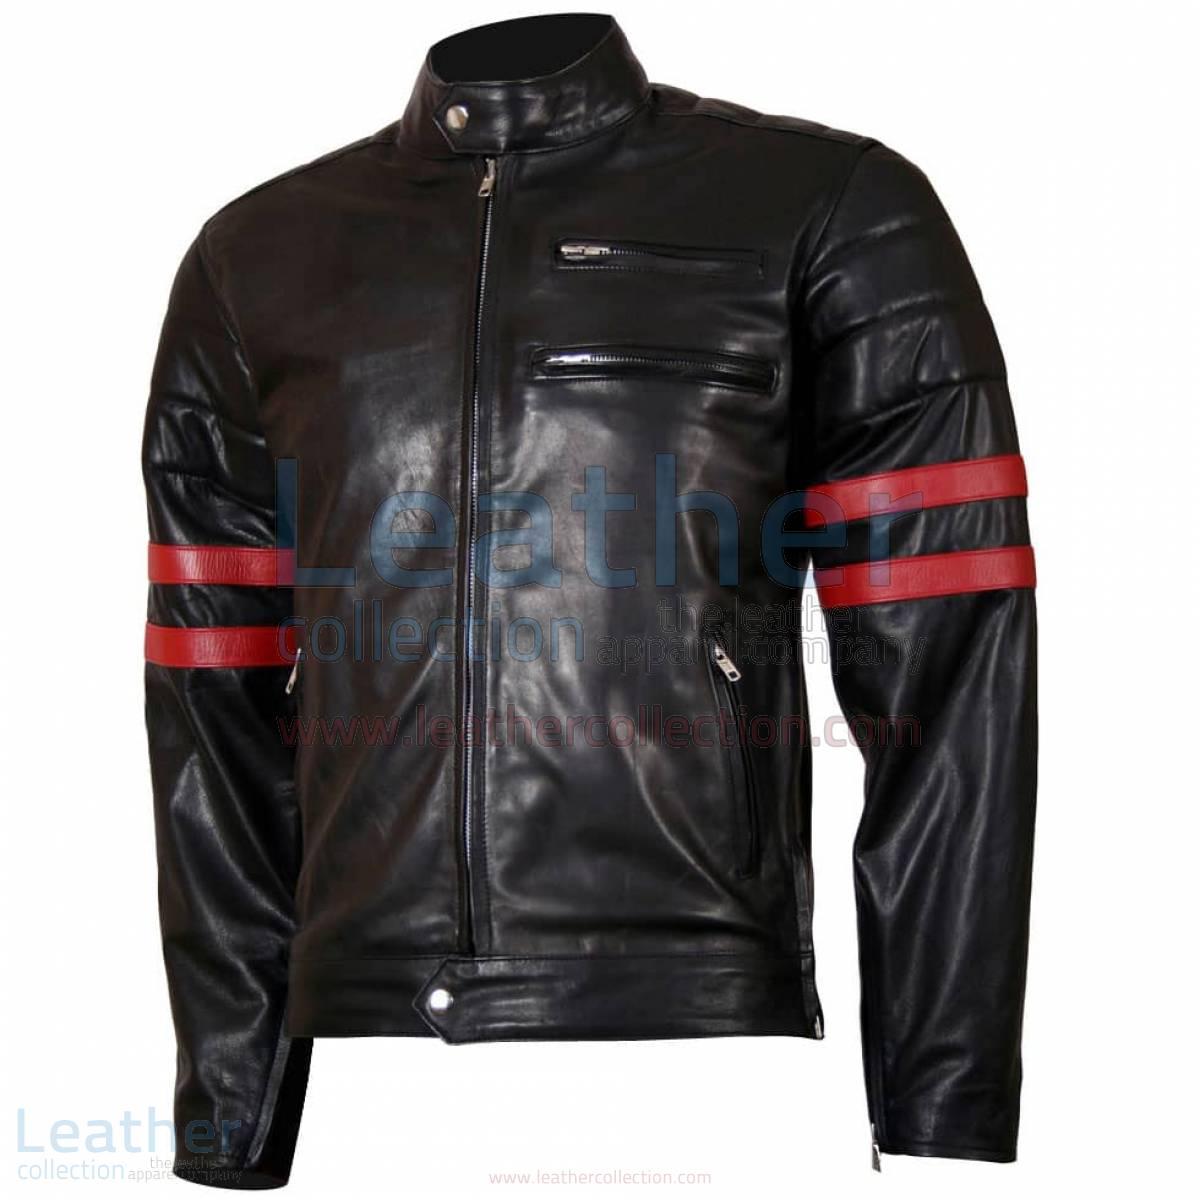 X-Men Wolverine Black with Red Strips Biker Leather Jacket –  Jacket